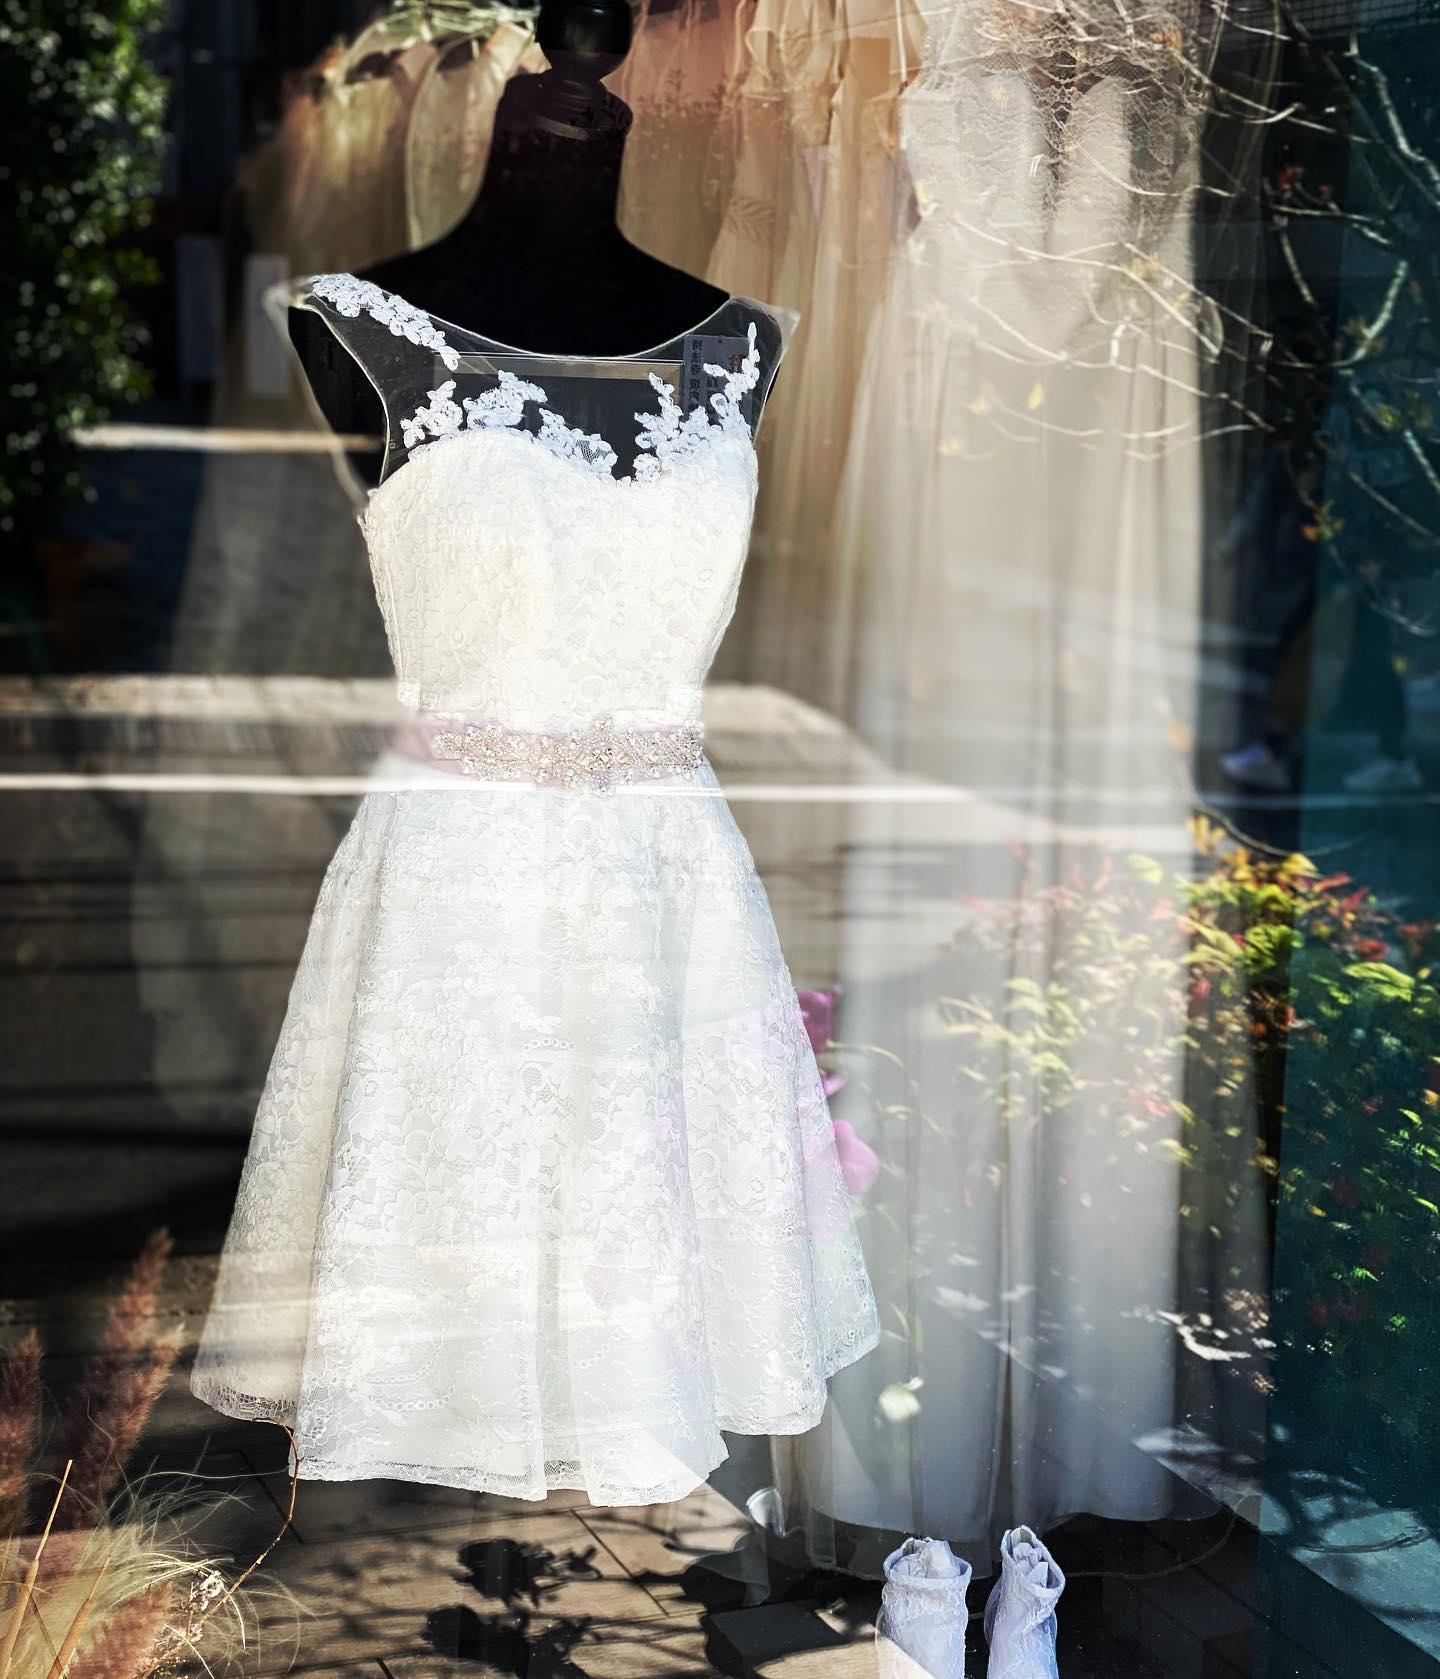 ・🕊Claras オススメミニdress🕊今日はショーウィンドウを#ミニドレス でコーディネート・最近人気のミニdressフォトウエディングでスニーカーやお洒落なパンプスと合わせて一味違うスタイリングをしたい方にオススメ・今の時代だから自分だけのスタイリングを楽しんで・PEPITA ¥120,000サッシュベルト ¥13,000・#wedding #weddingdress #claras #paris #vowrenewal #aoyama #spur #spurwedding #ウェディングドレス #プレ花嫁 #ドレス試着 #2021夏婚 #2021冬婚 #ヘアメイク #結婚式  #ドレス選び #前撮り #後撮り #フォトウェディング #ウェディングヘア  #フォト婚 #前撮り写真 #ブライダルフォト #カップルフォト #ウェディングドレス探し #ウェディングドレス試着 #レンタルドレス #ドレスショップ#ドレス迷子